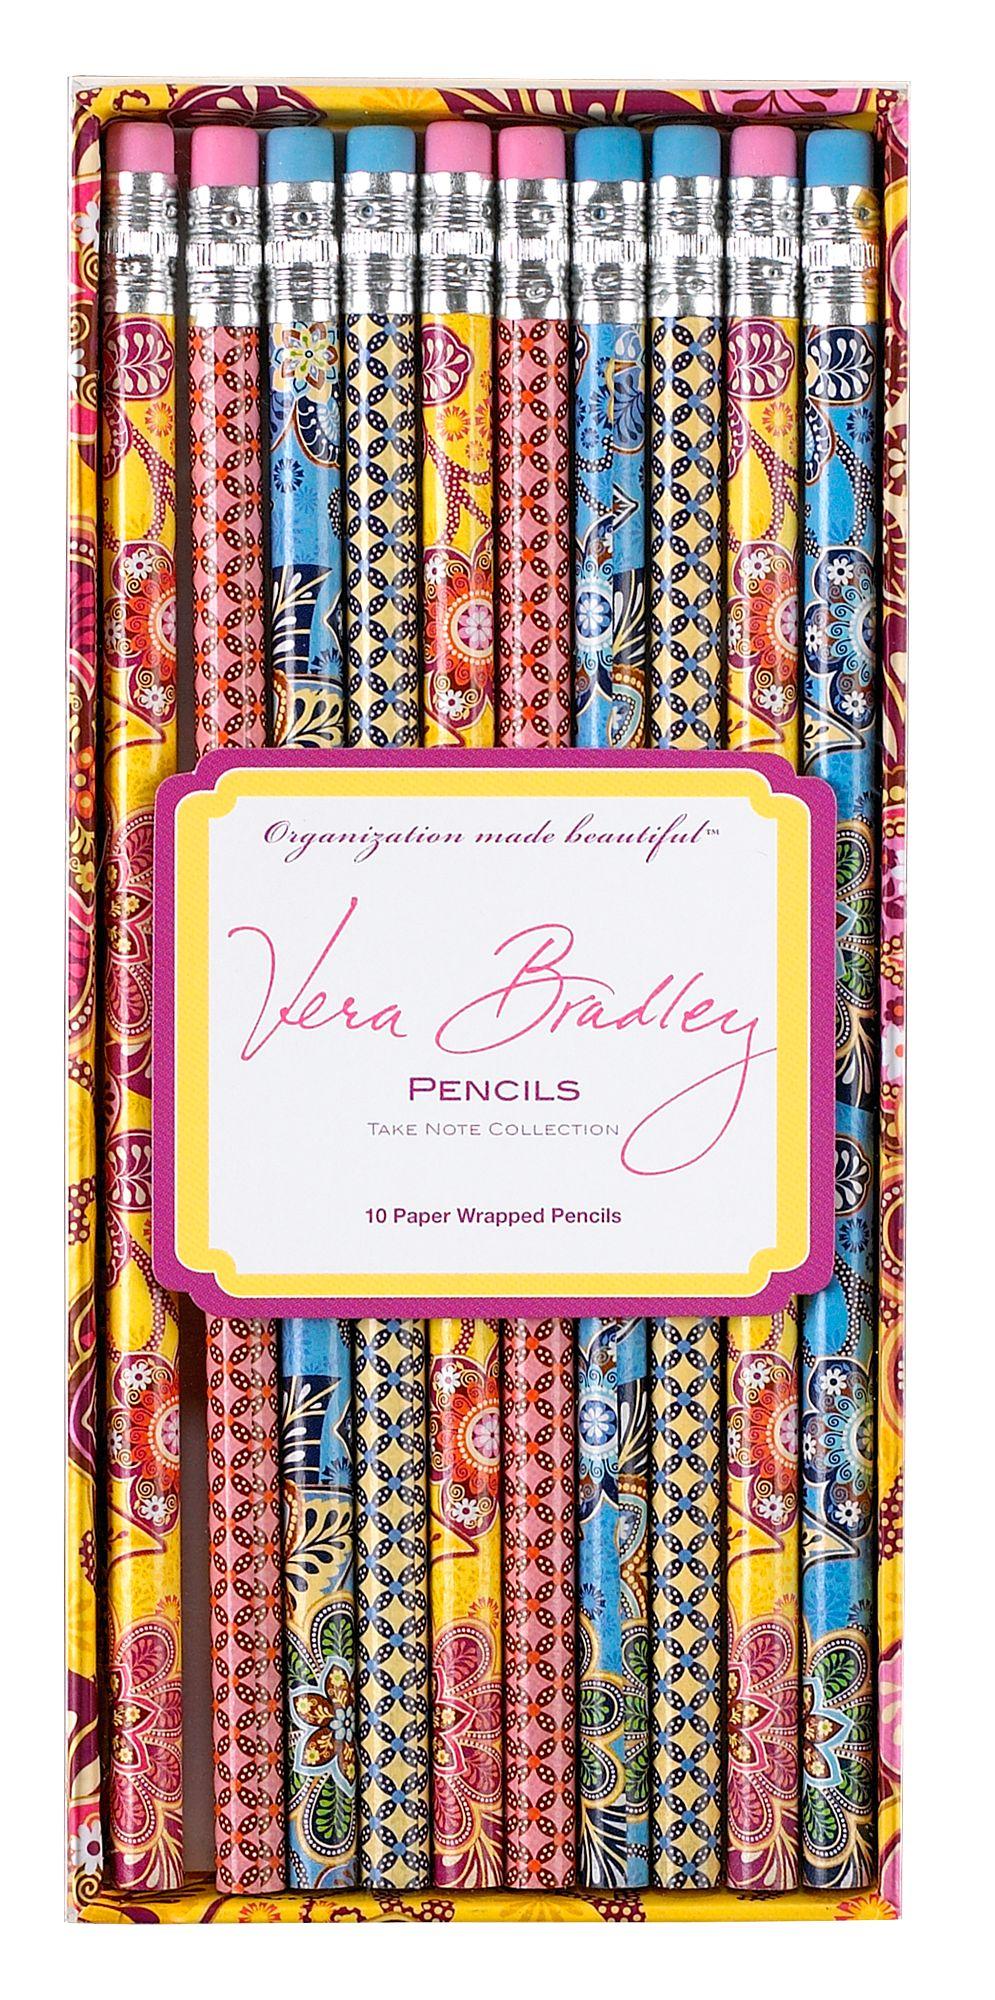 Back To School With Vera Bradley